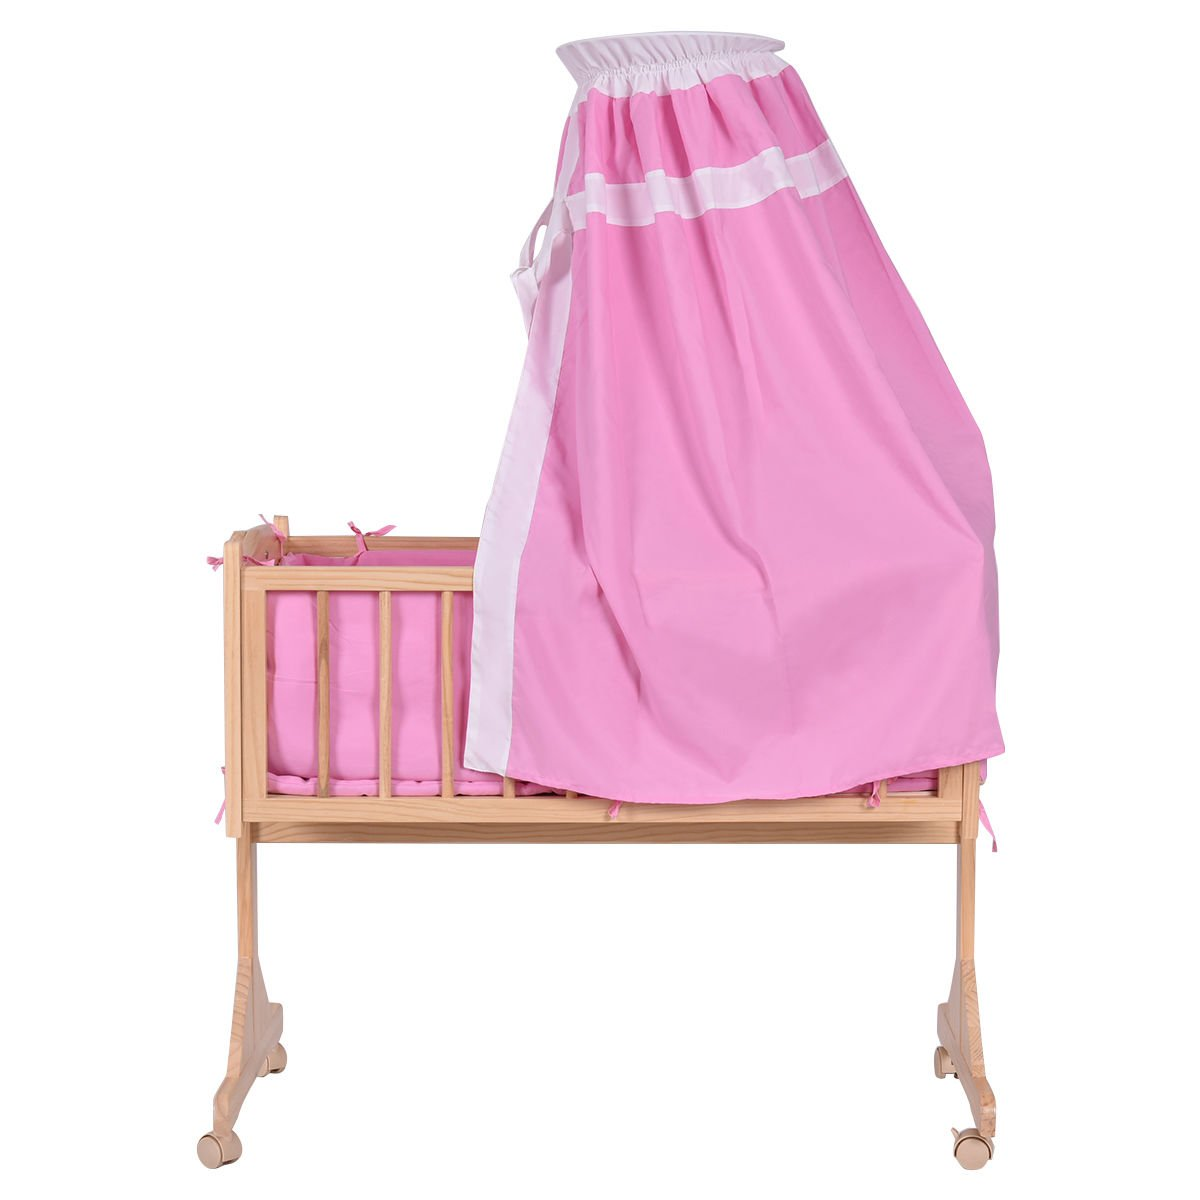 Wood Baby Cradle Rocking Crib Newborn Bassinet Bed Sleeper Portable Nursery Pink by onestops8 (Image #4)